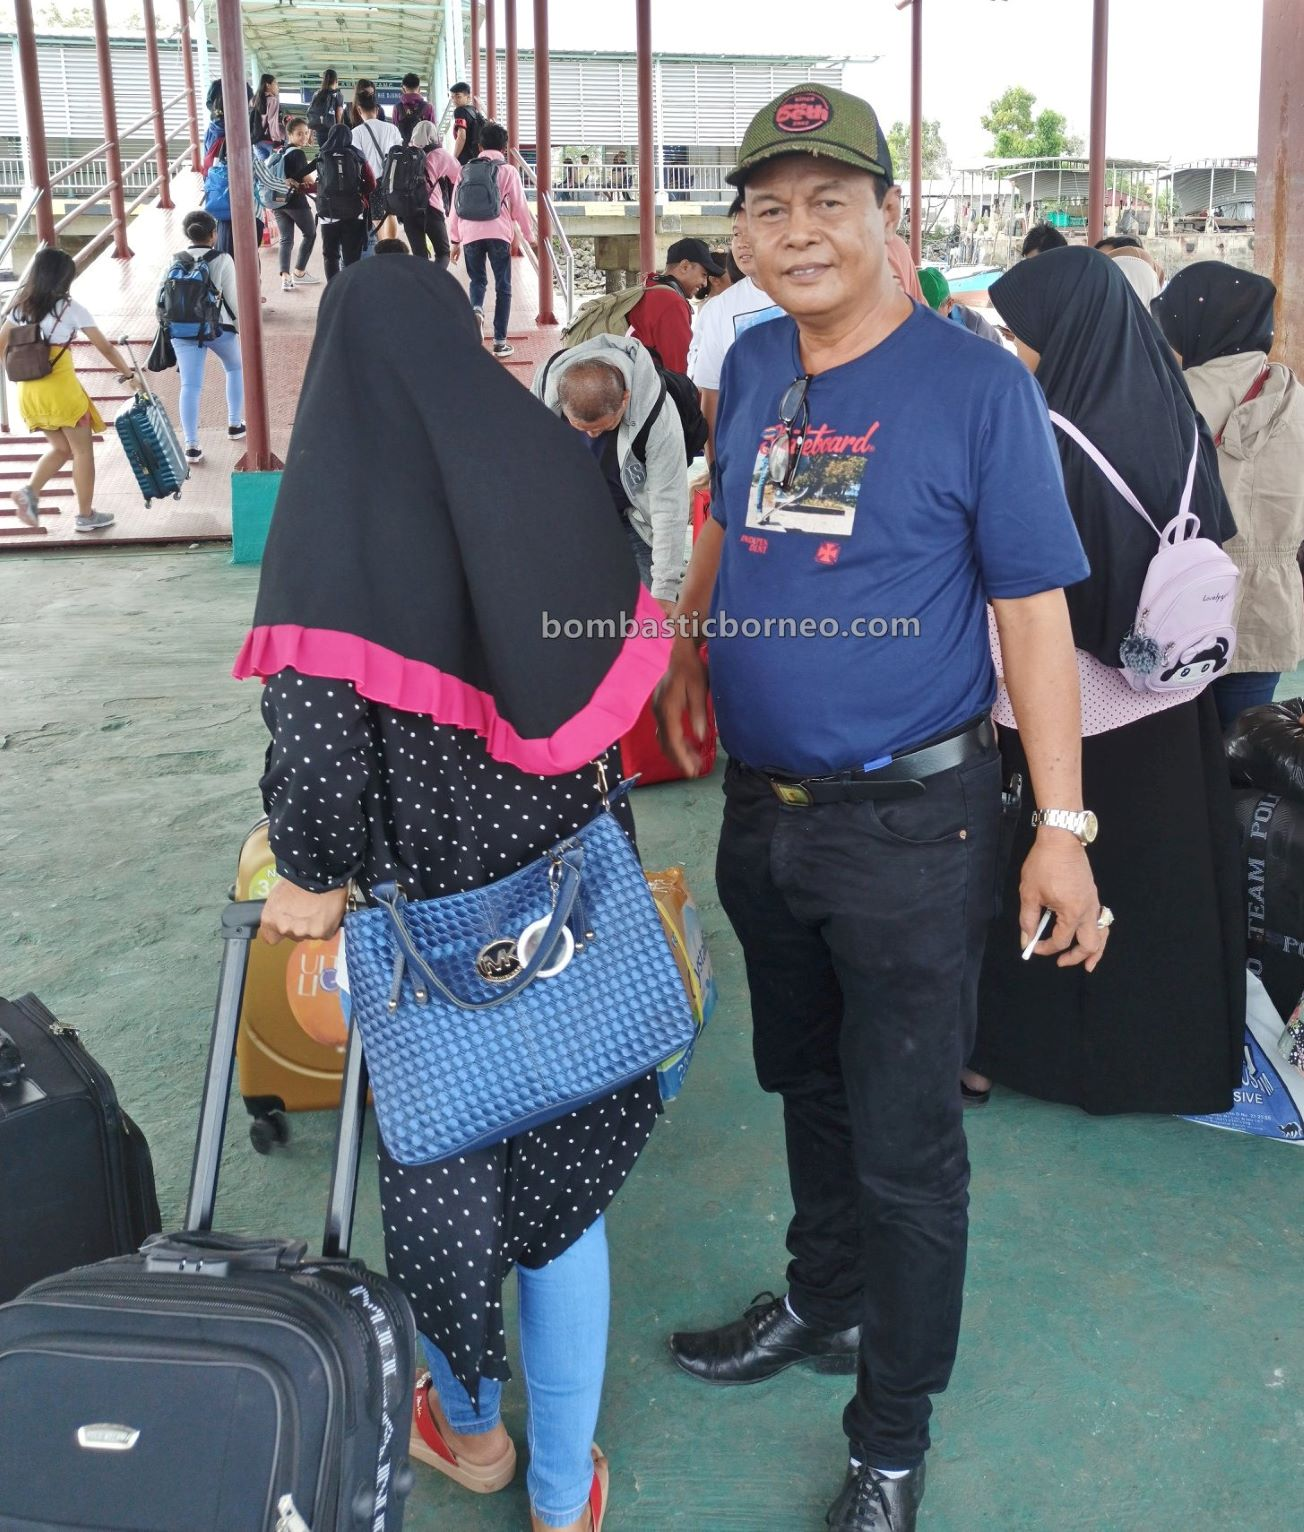 fam trip Kaltara, express boat, Boat ride, Kapal Besar, Transportation, Tawau, backpackers, destination, exploration, objek wisata, travel guide, Trans Border, ferry terminal, Borneo